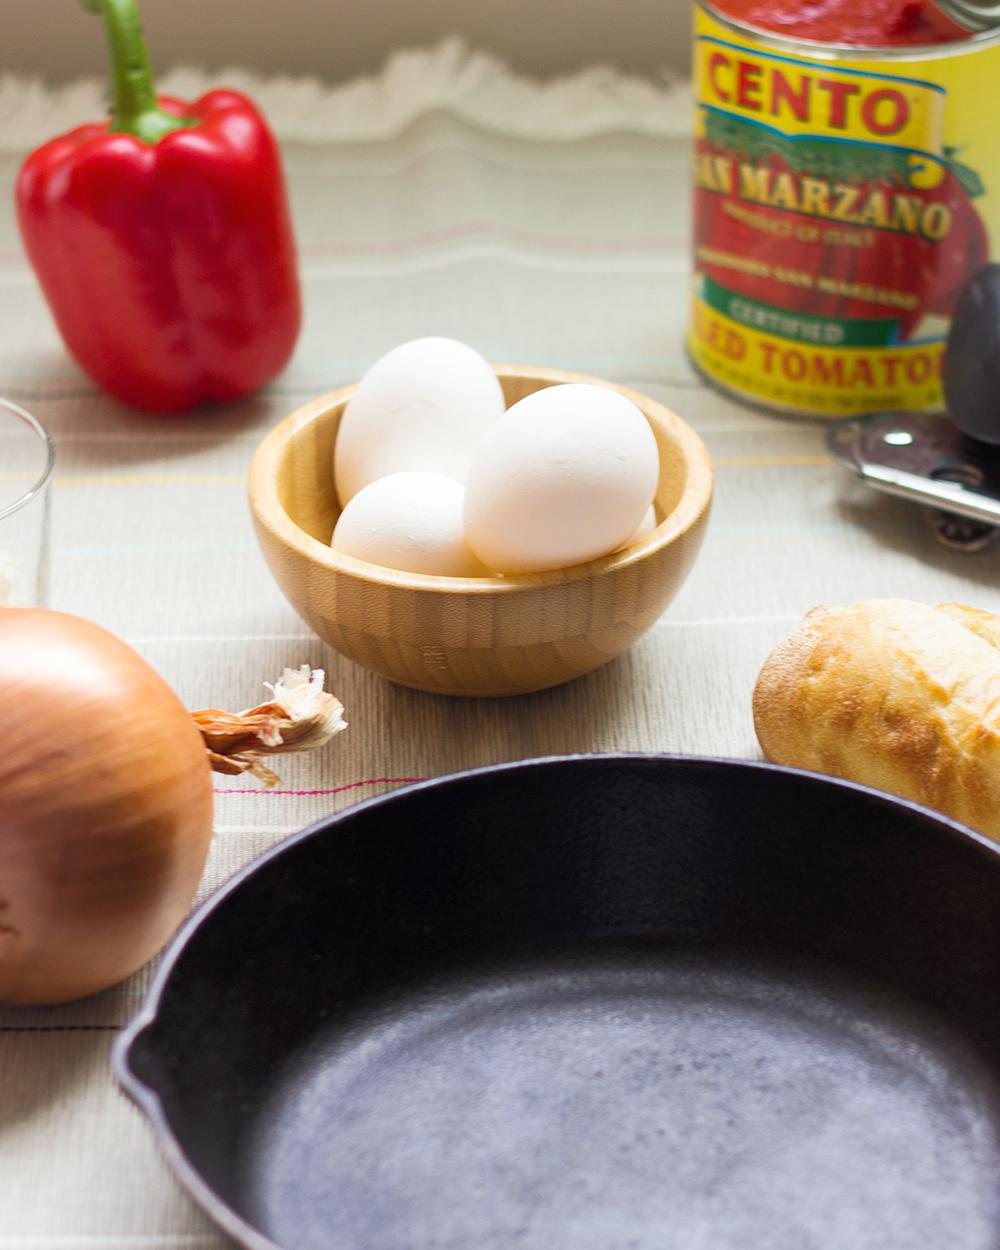 livvyland-blog-olivia-watson-austin-texas-lifestyle-blogger-healthy-shakshuka-recipe-vegetarian-2